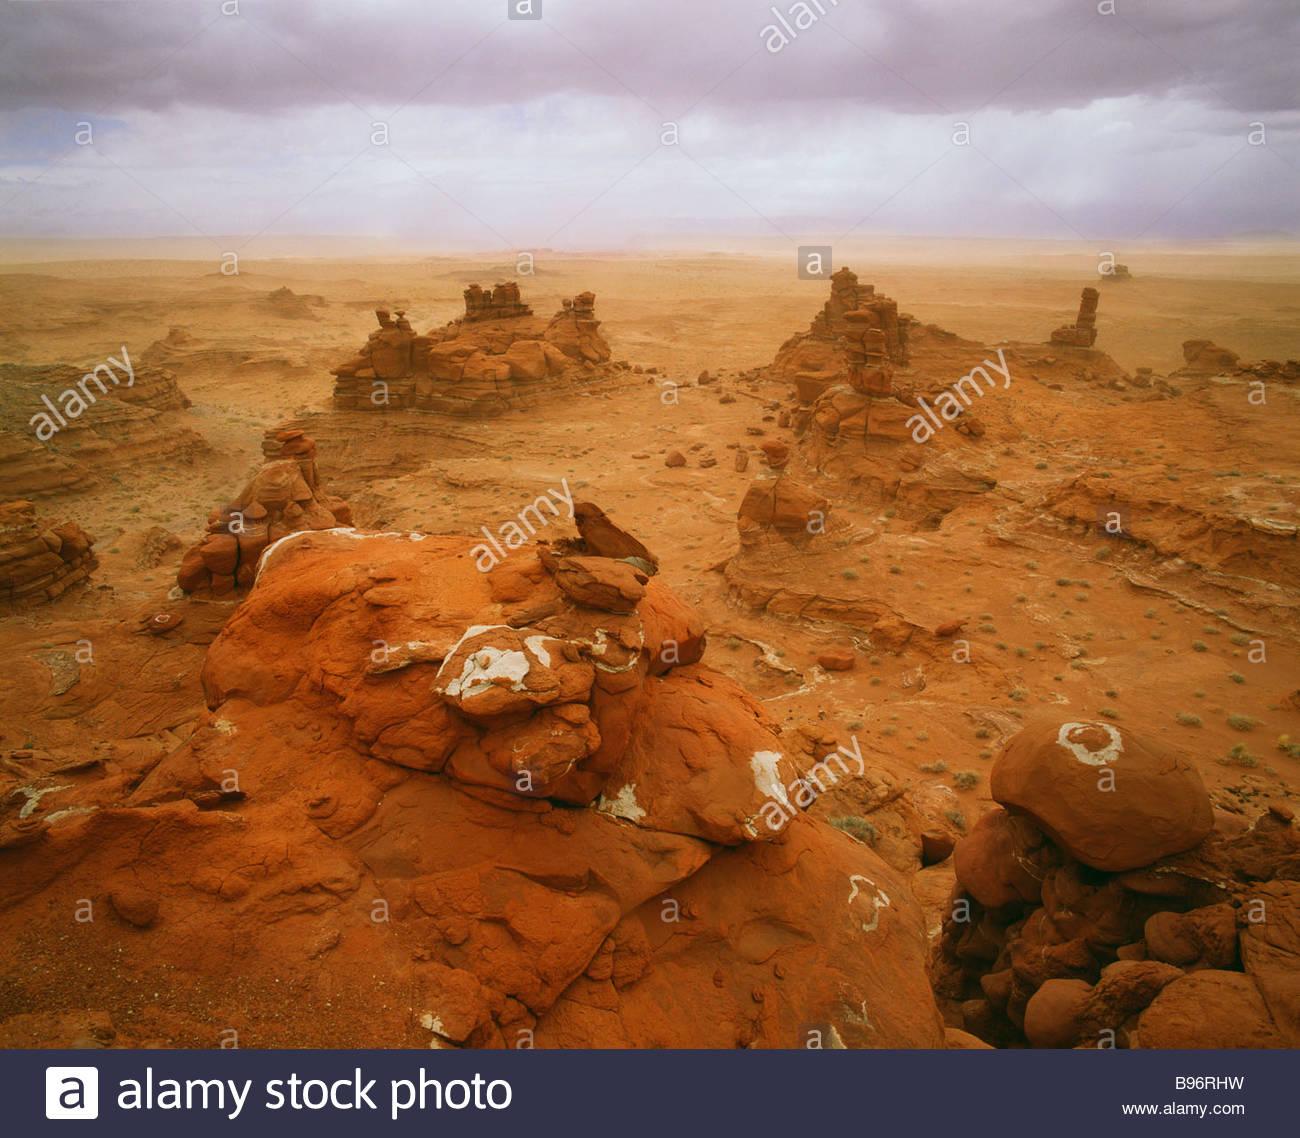 Spring sandstorm along the Adeiii Eechii cliffs Western Painted Desert Navajo Indian Reservation Arizona Stock Foto